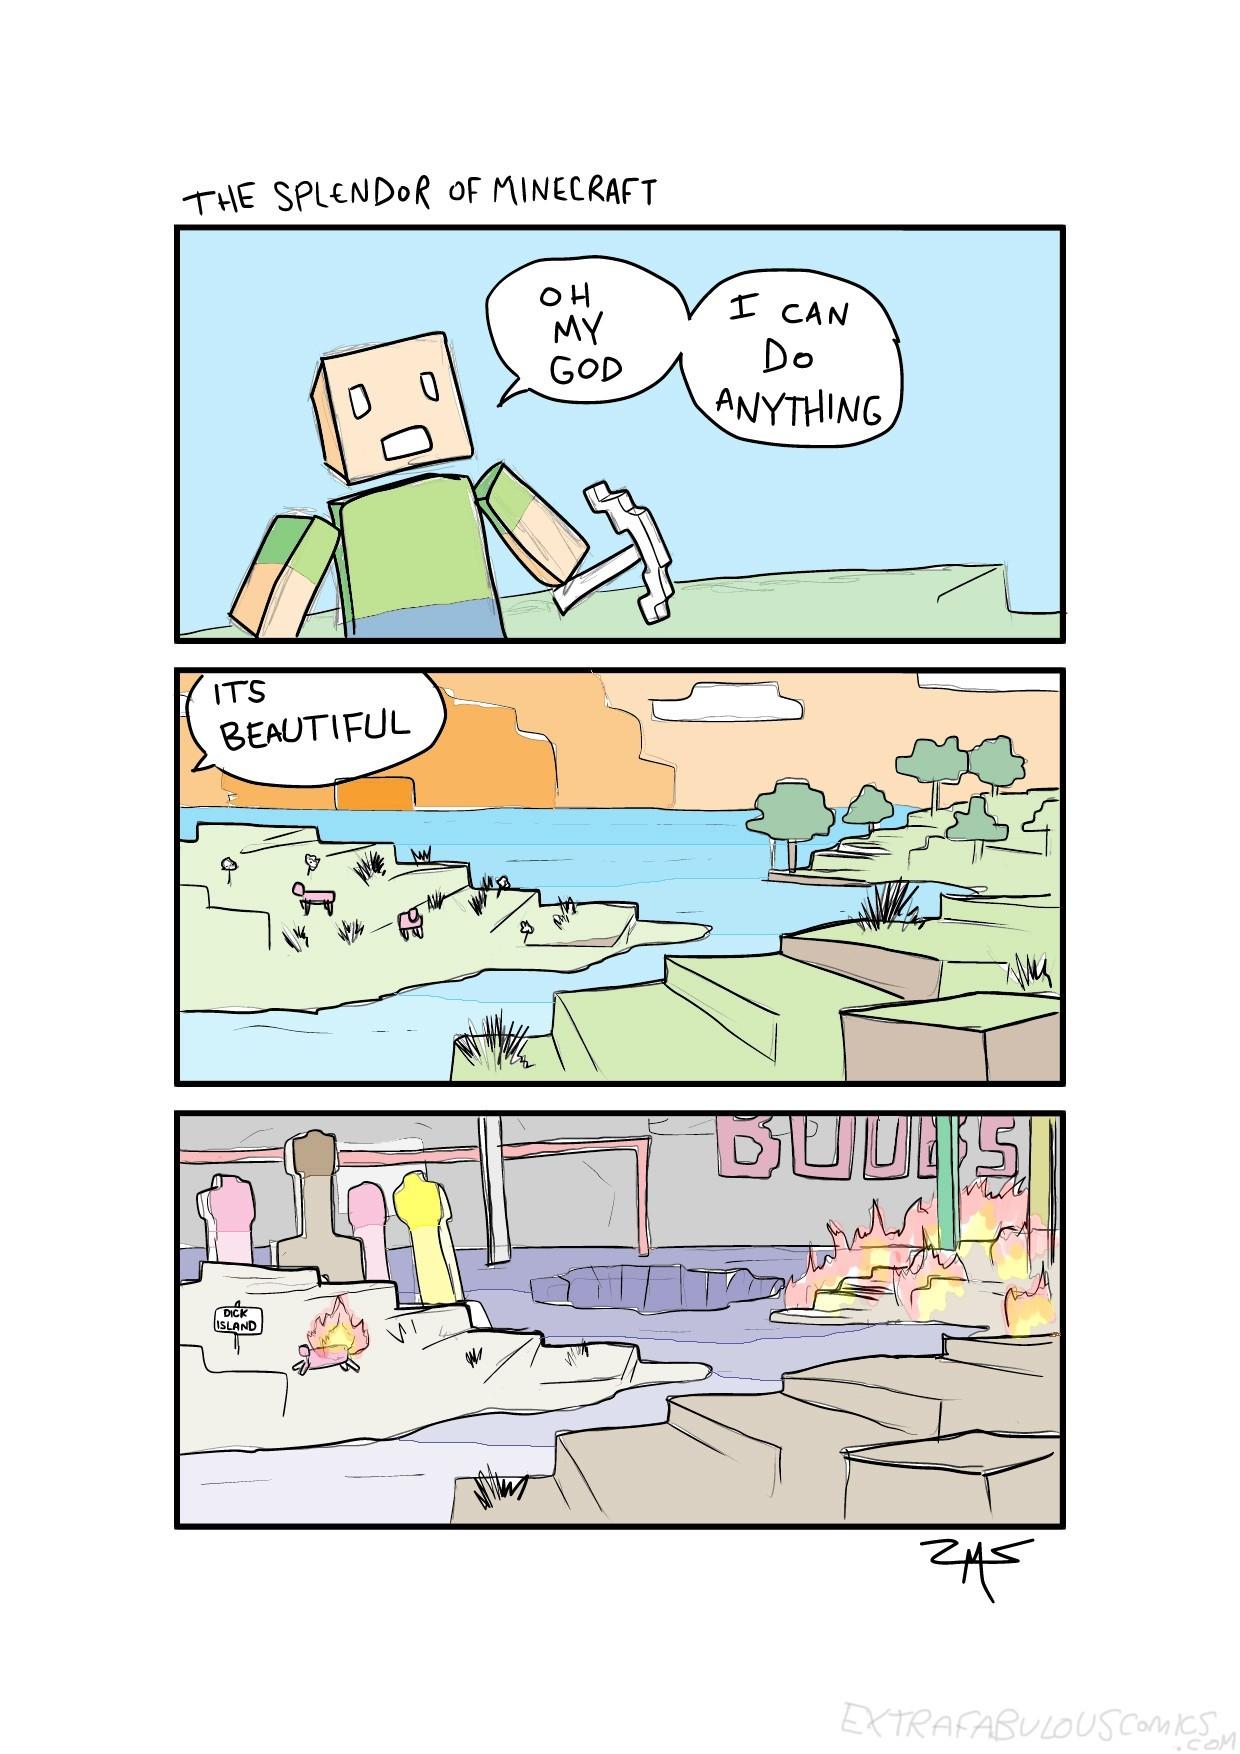 Oh minecraft - meme